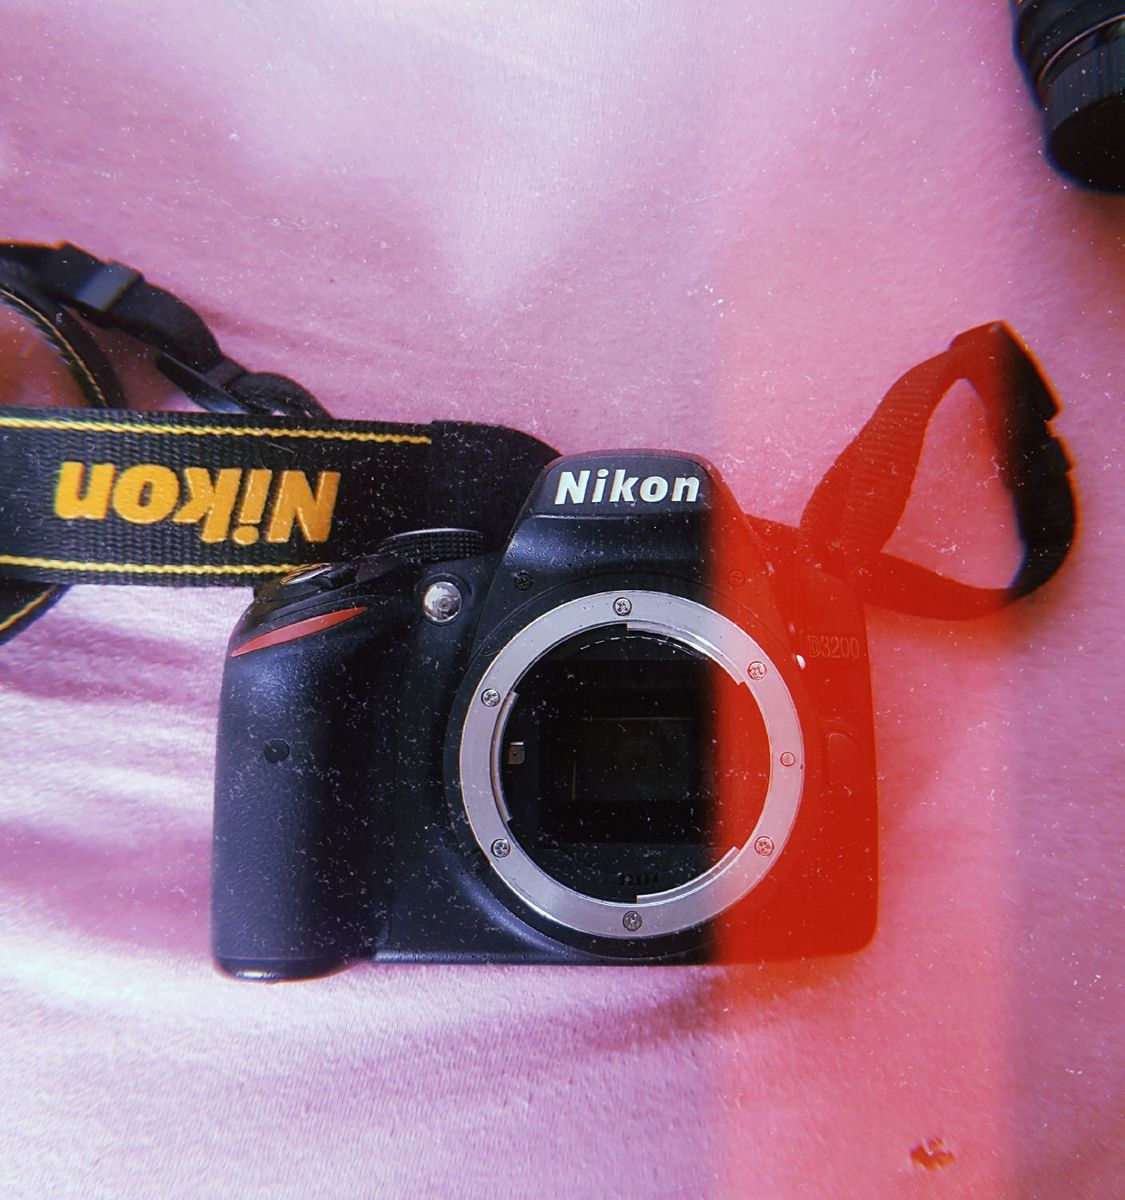 nikon d3200 + lentes + acessórios - vintage e retrô nikon